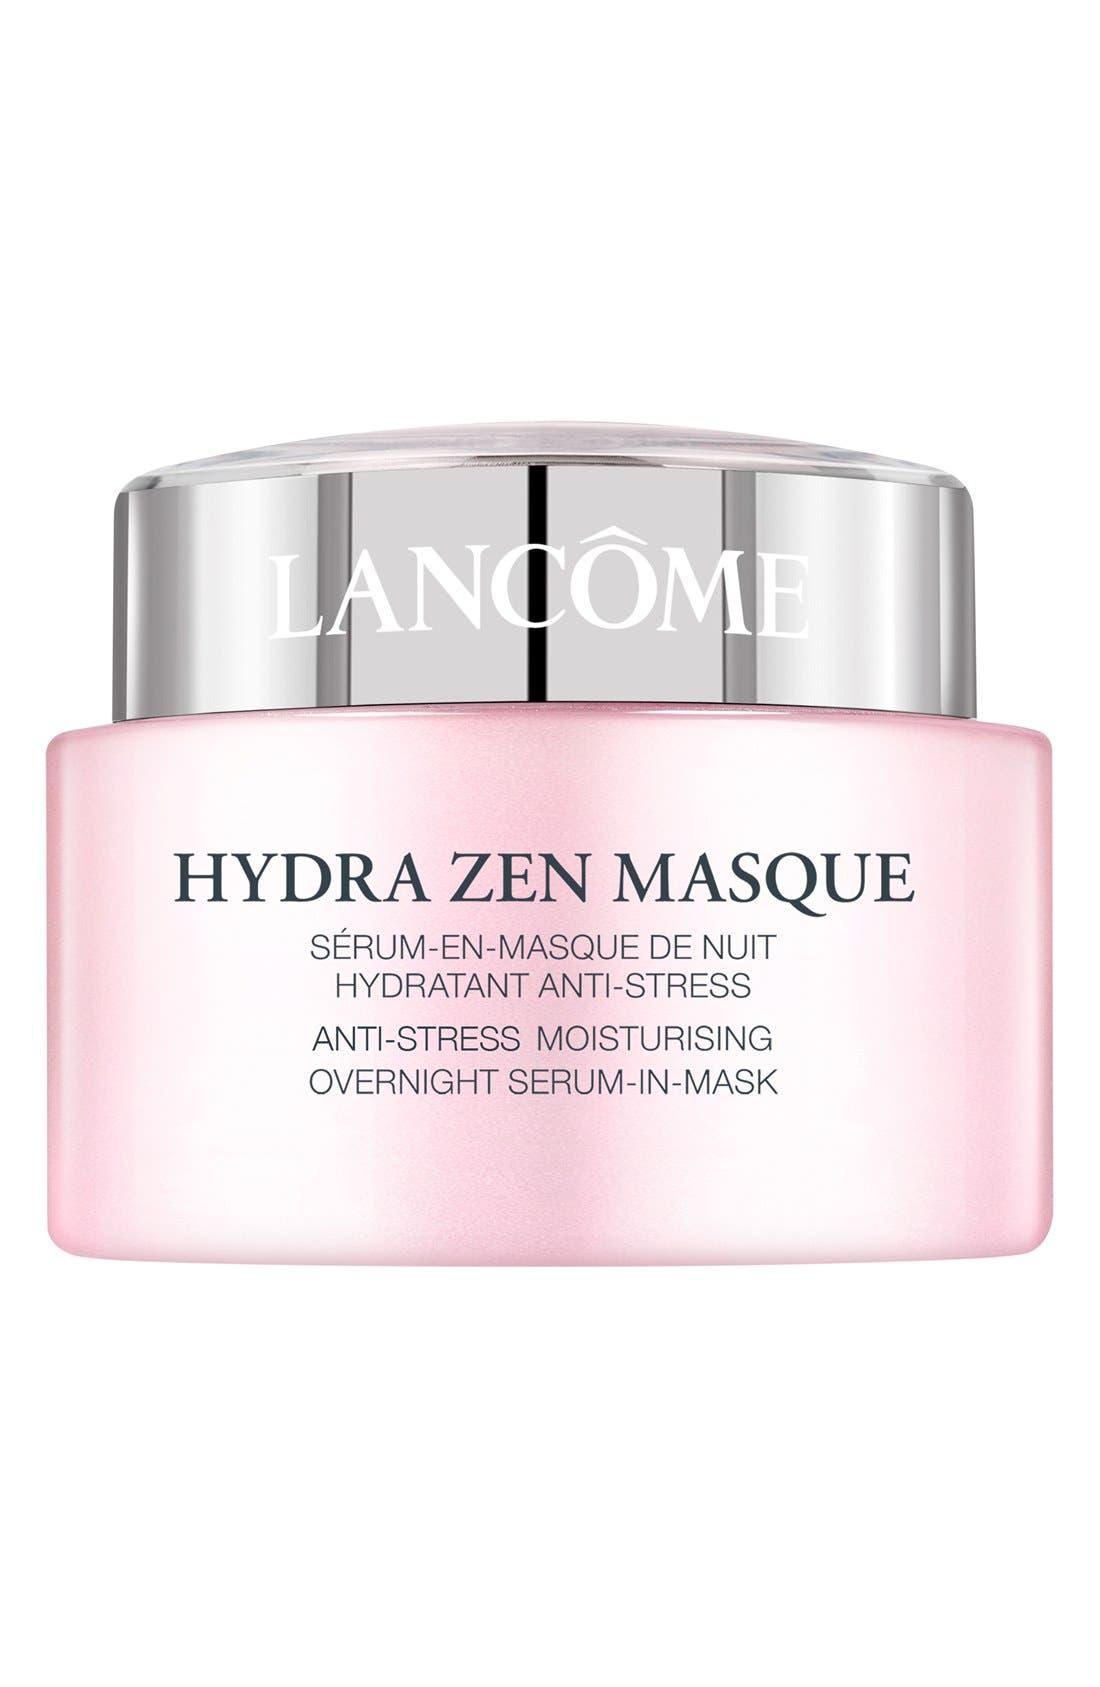 Hydra Zen Anti-Stress Moisturizing Overnight Serum-in-Mask,                         Main,                         color, NO COLOR